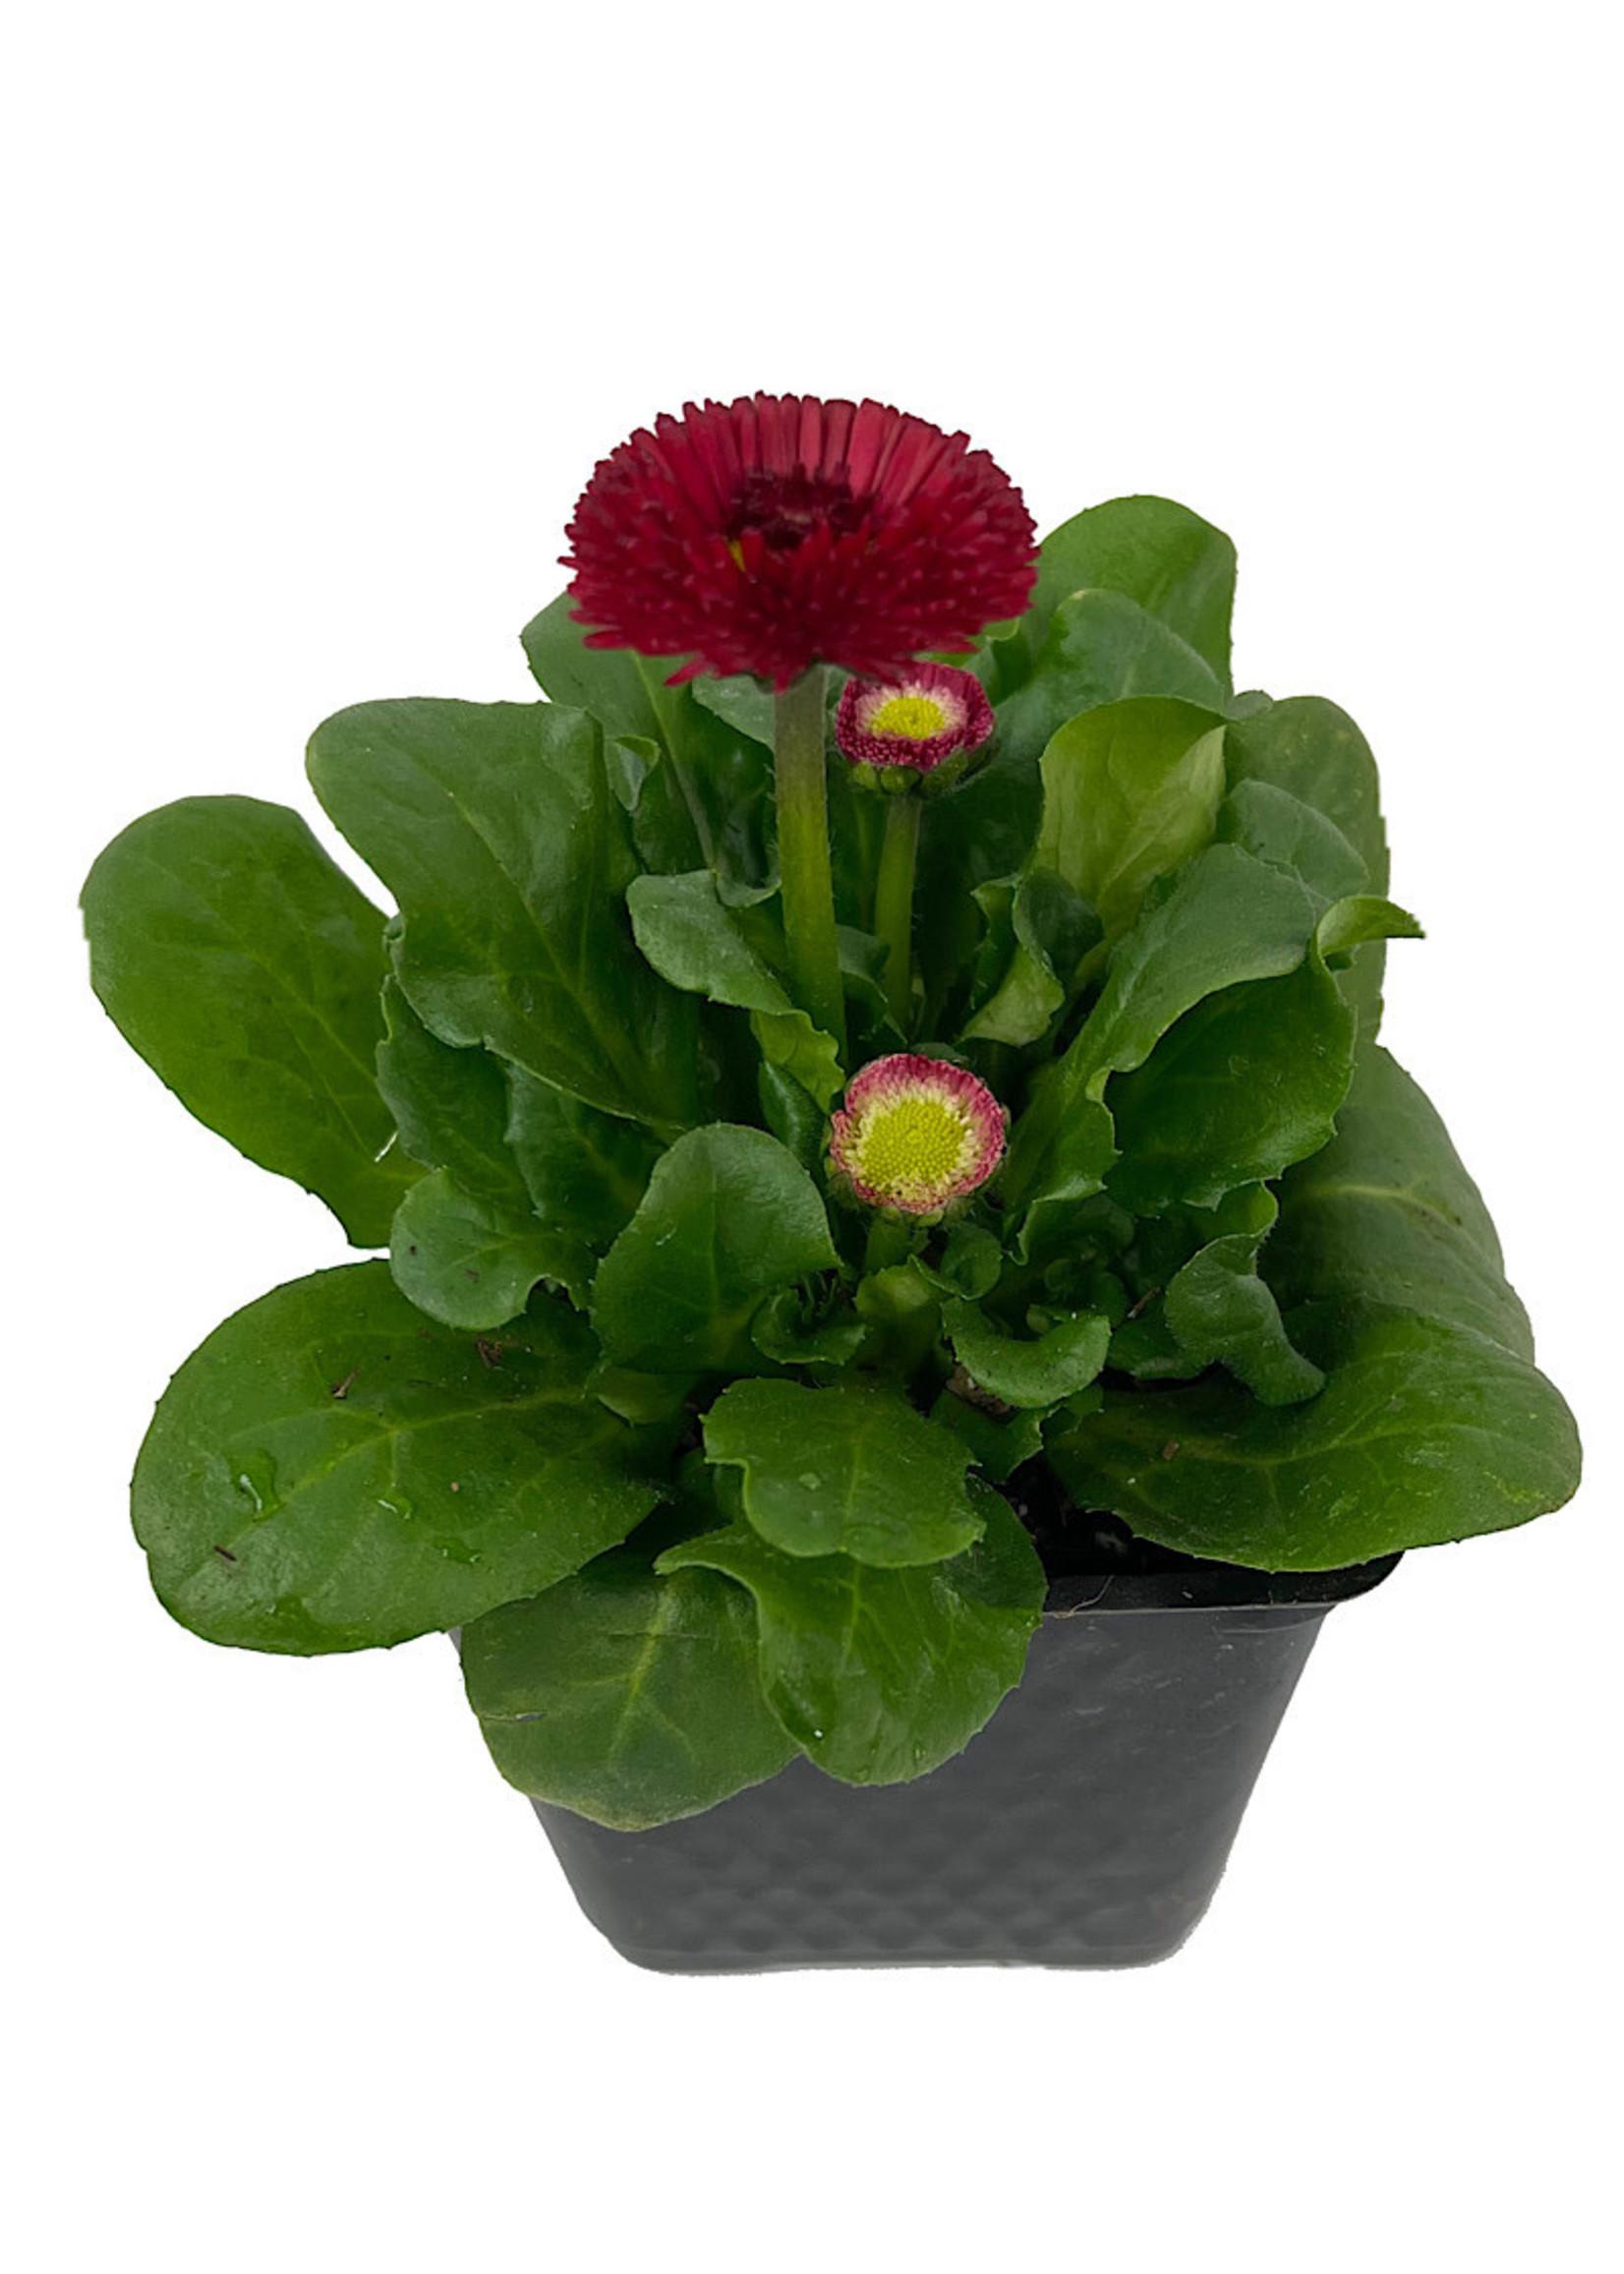 Bellis p. 'Tasso Red' 4 inch